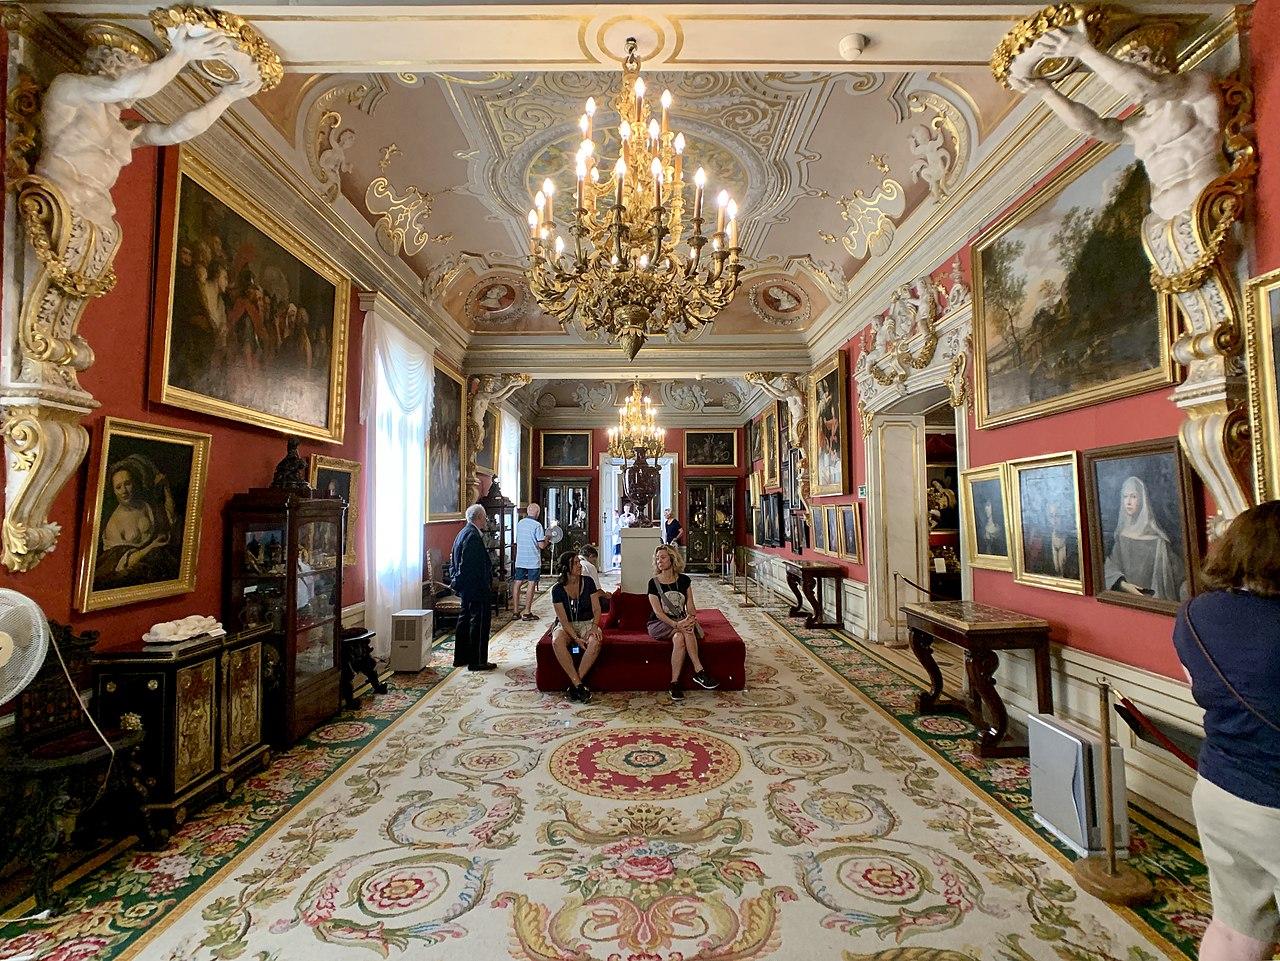 Interior of the Wilanów Palace, Warsaw, Poland 11.jpg